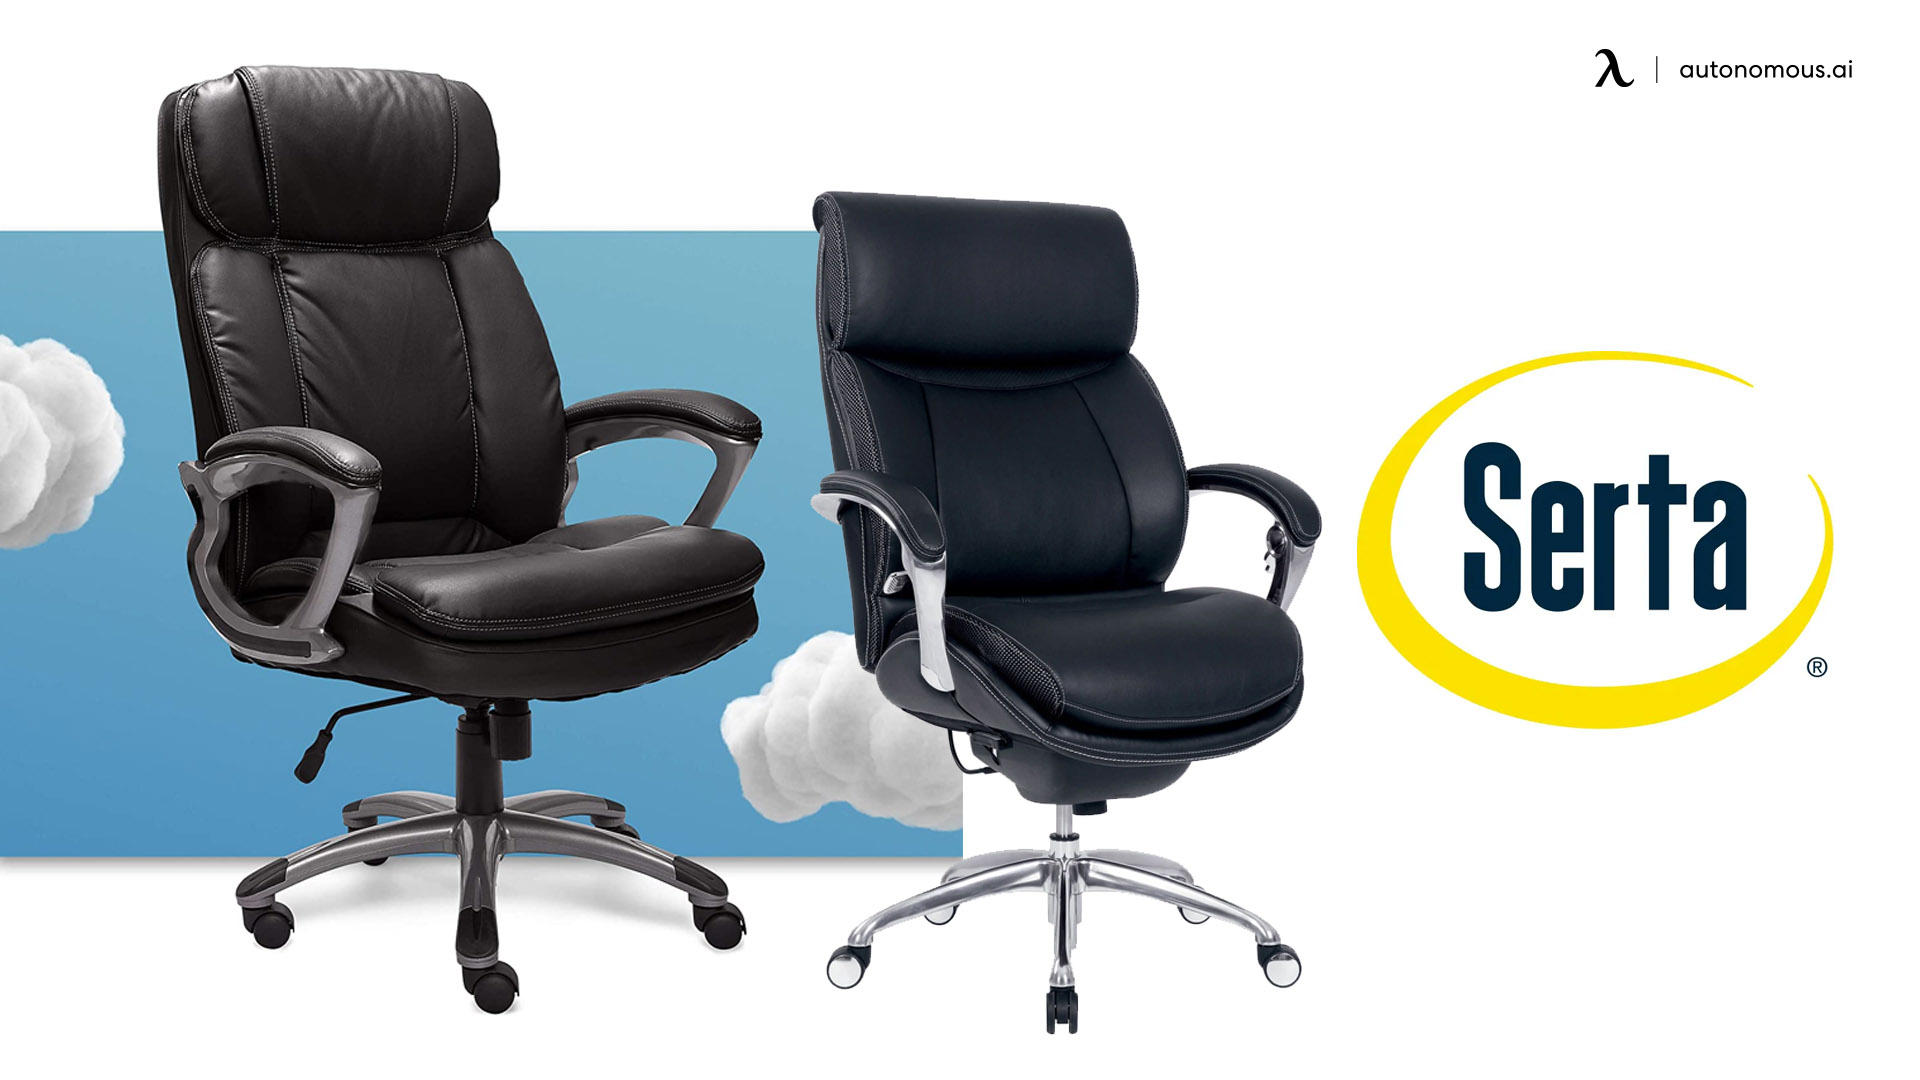 Serta Air Health and Wellness Executive Chair